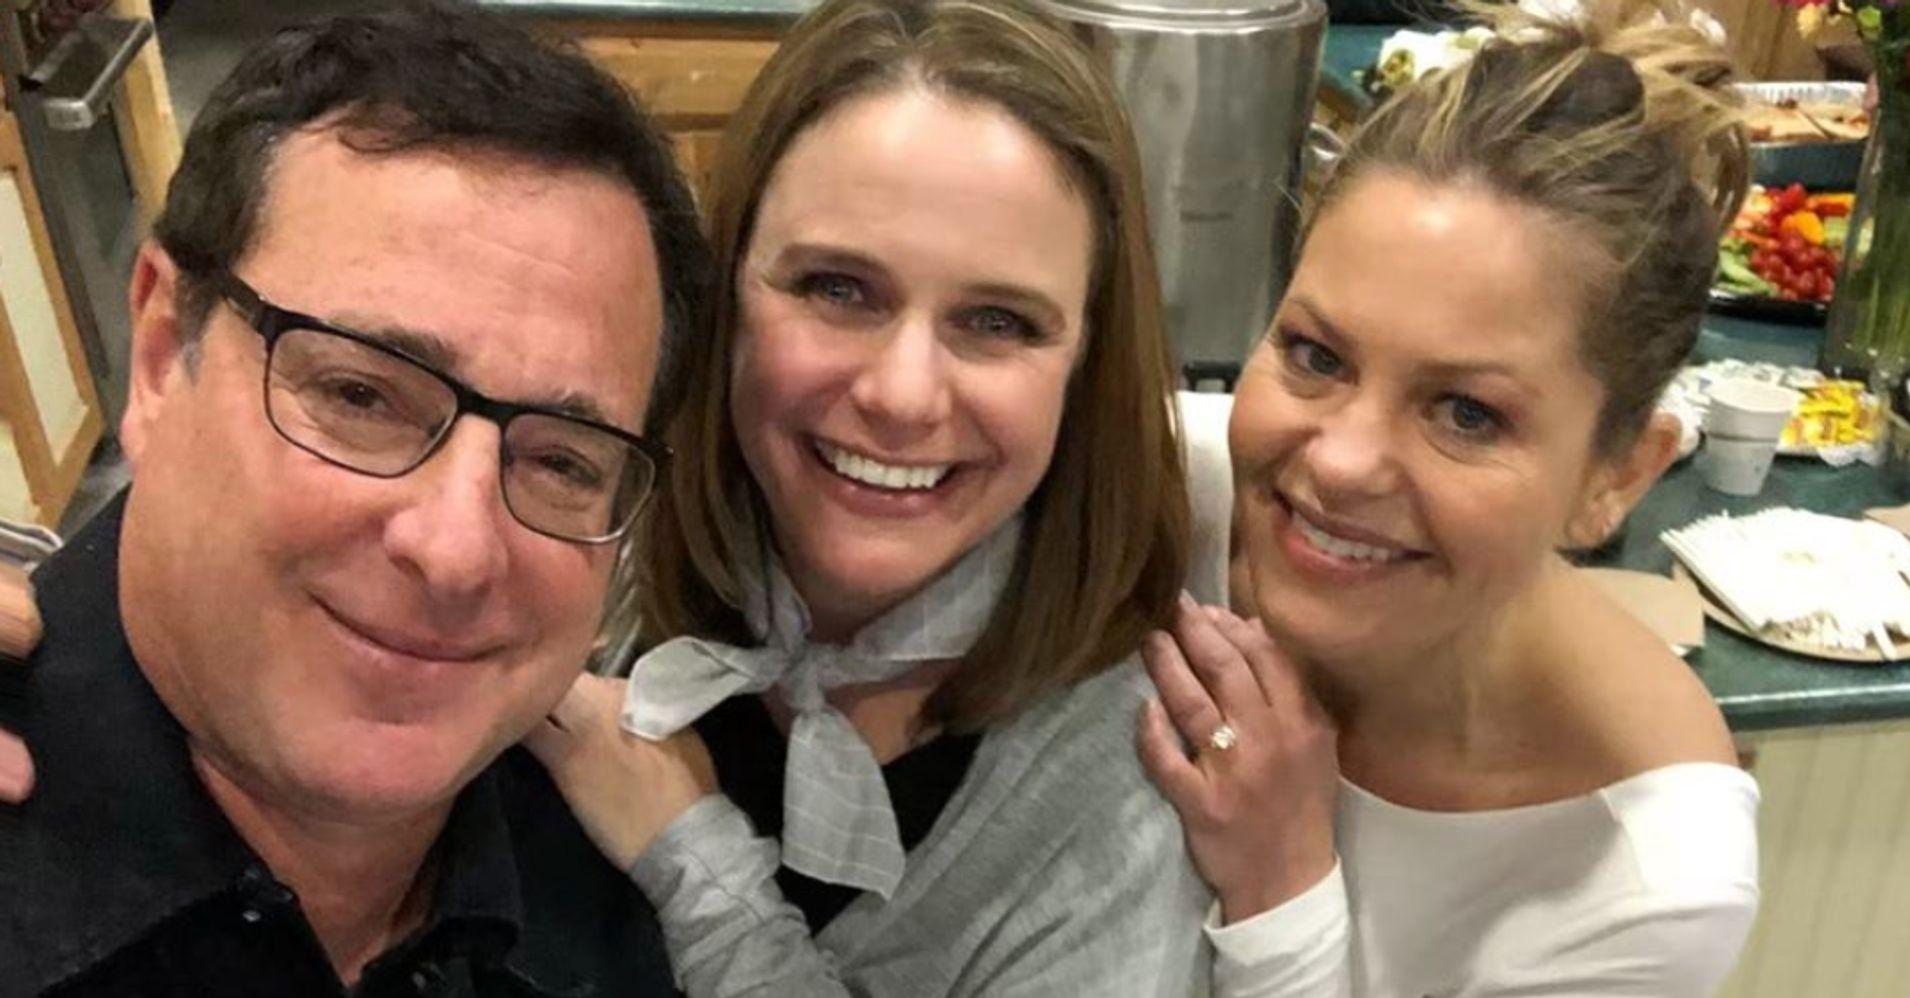 'Fuller House' Cast Begins Shooting Season 5 Sans Lori Loughlin's Aunt Becky